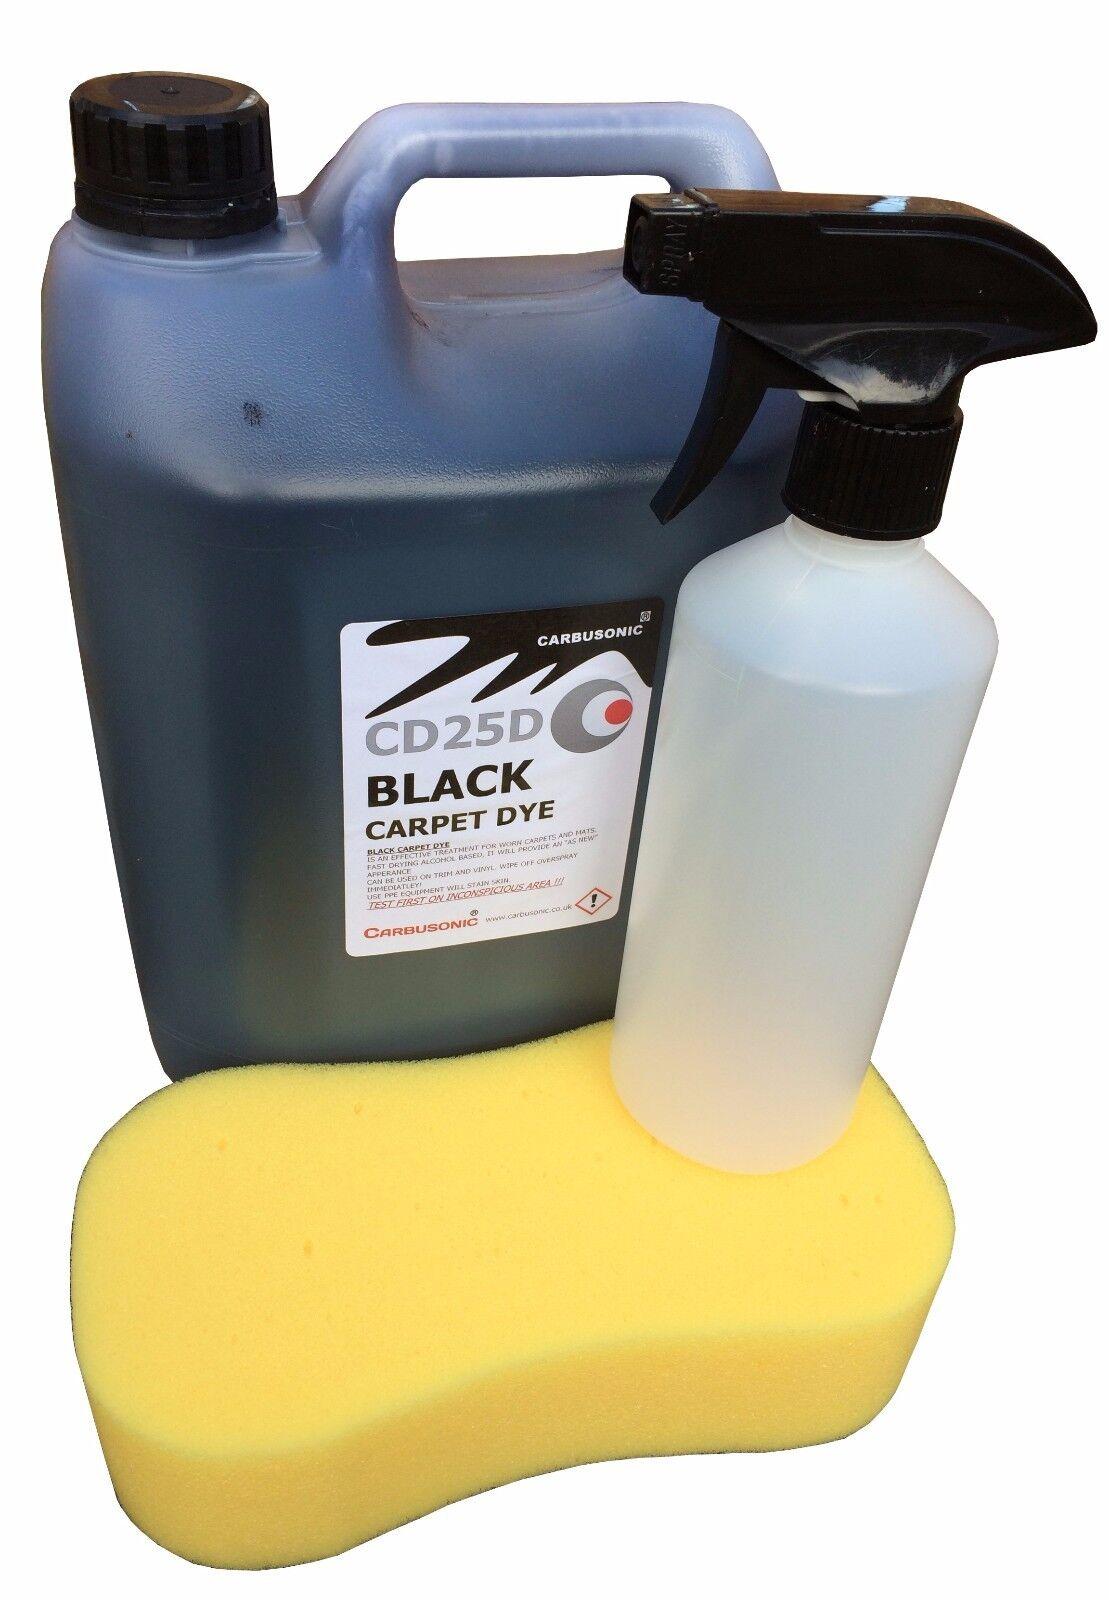 5 litre black carpet dye with trigger spray & sponge, car carpet renovation.